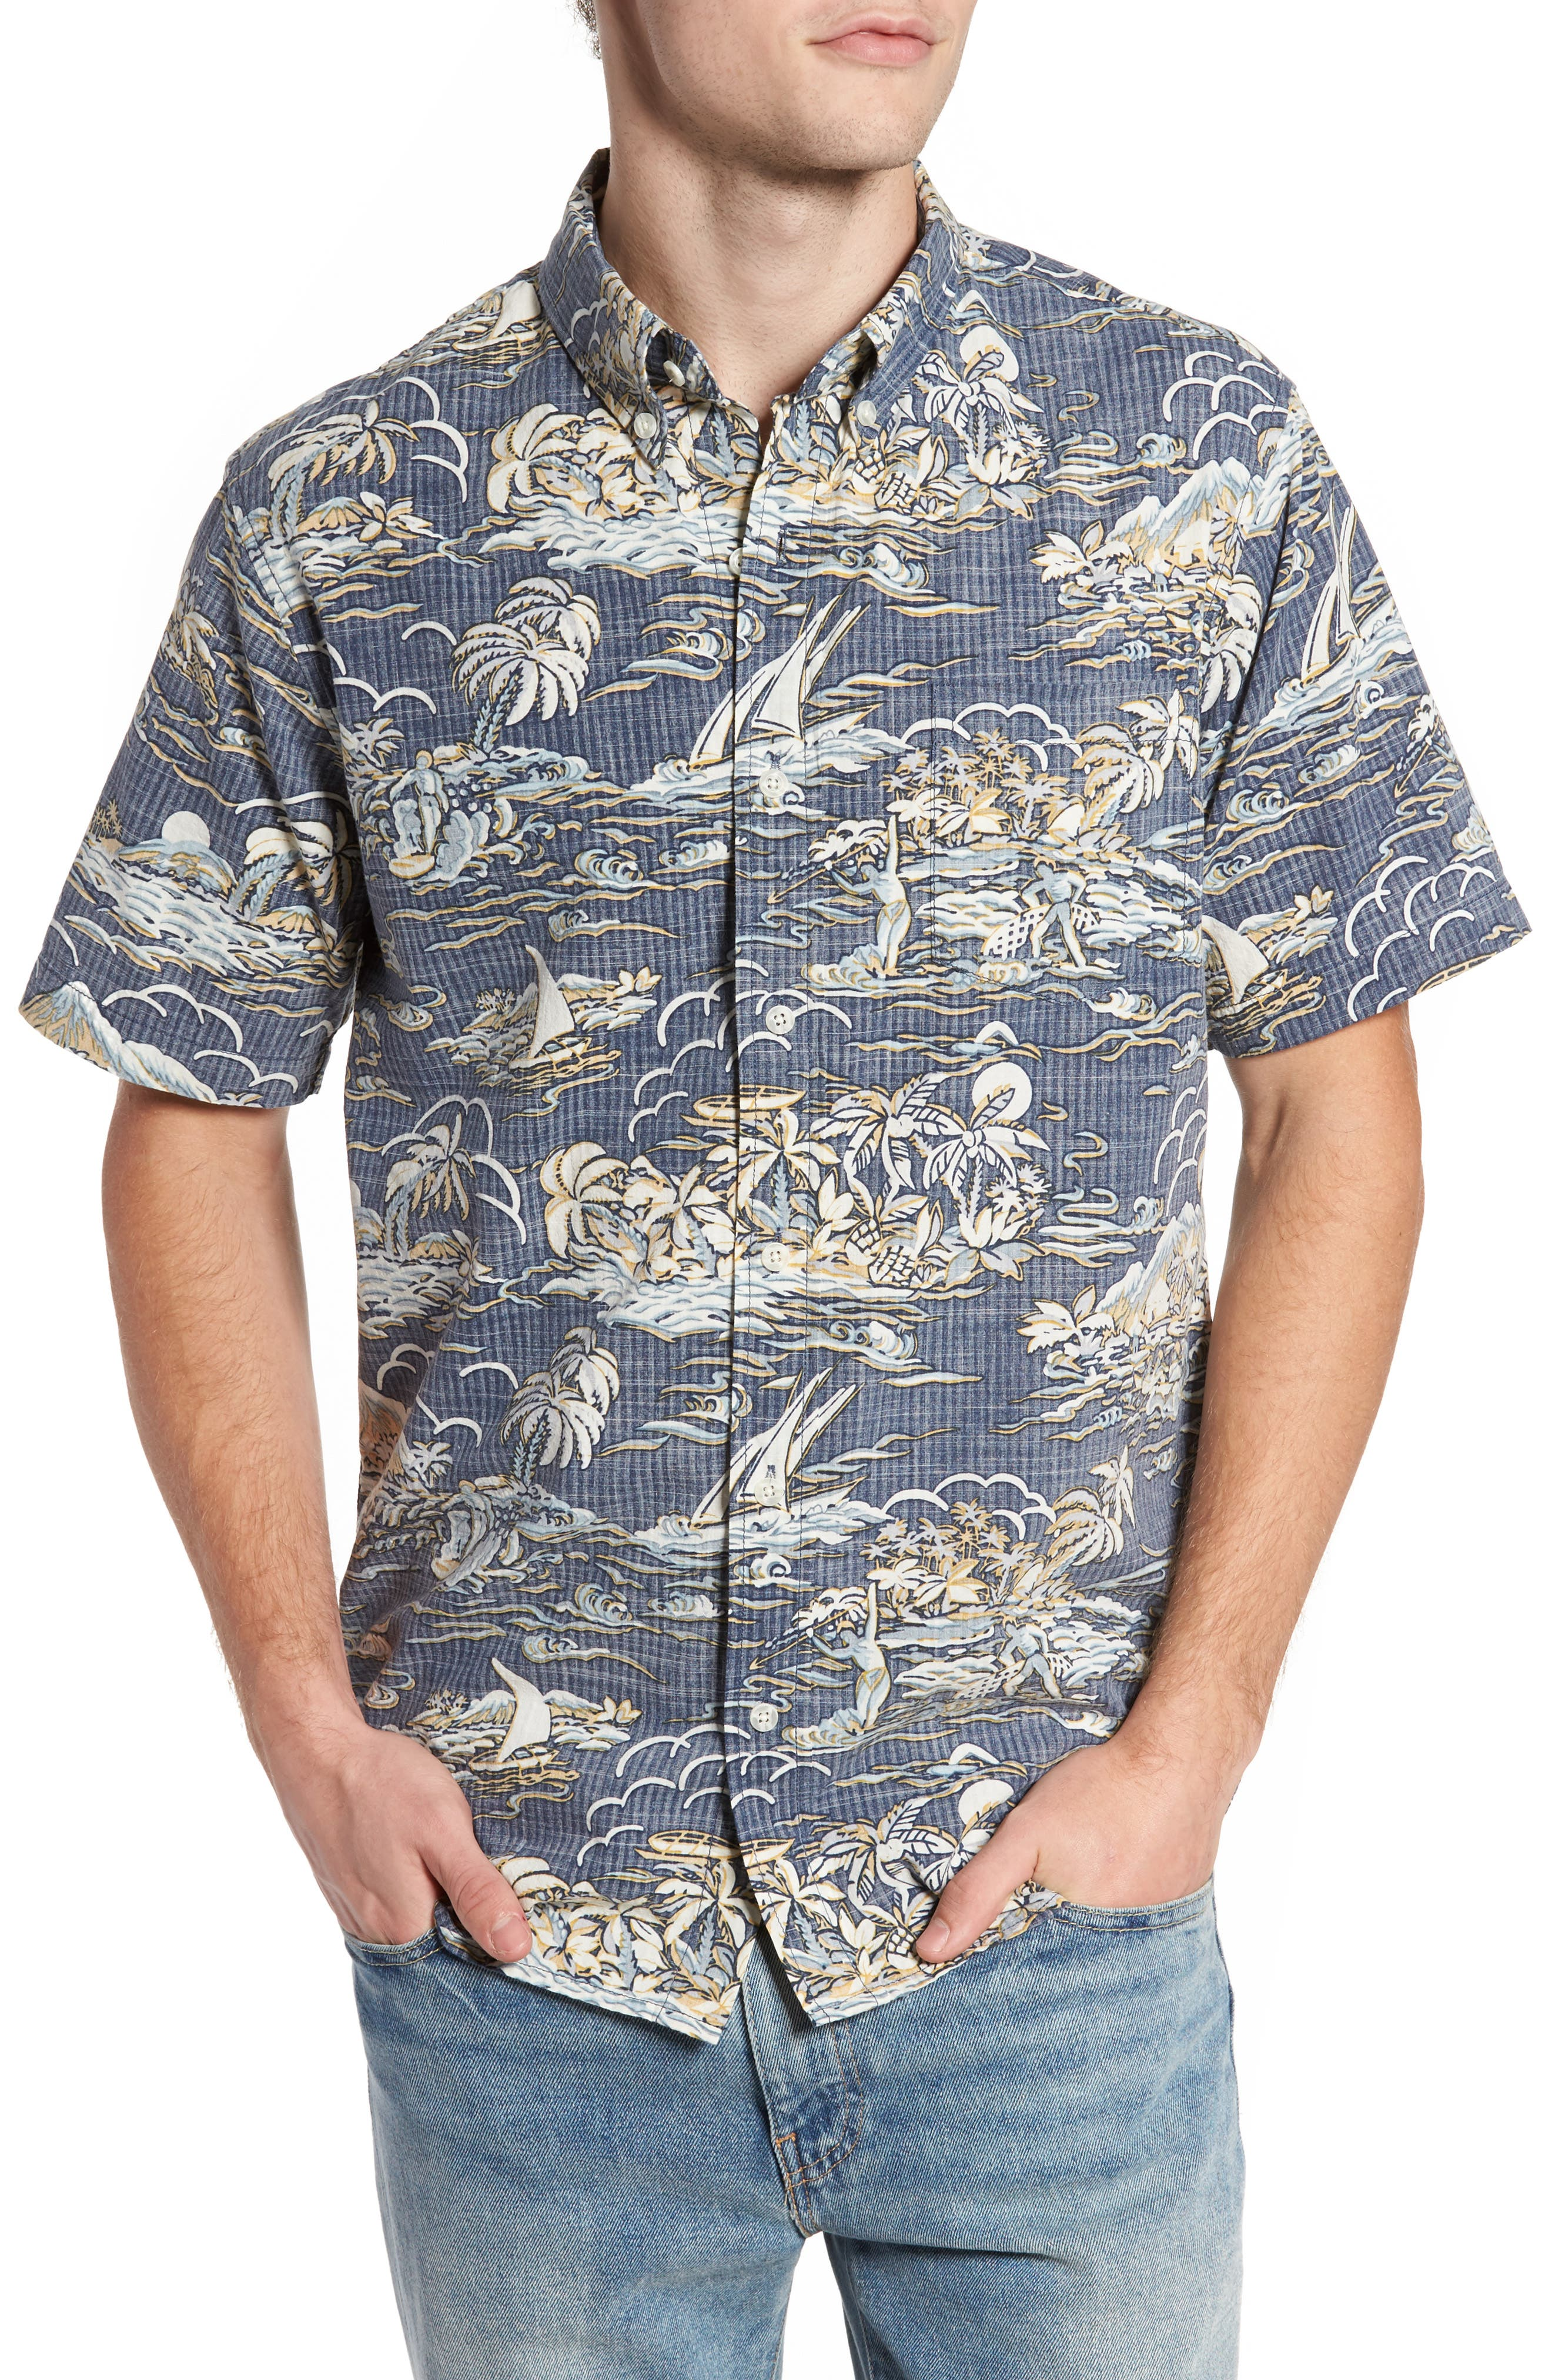 Main Image - Reyn Spooner Laupakahi Modern Fit Print Shirt